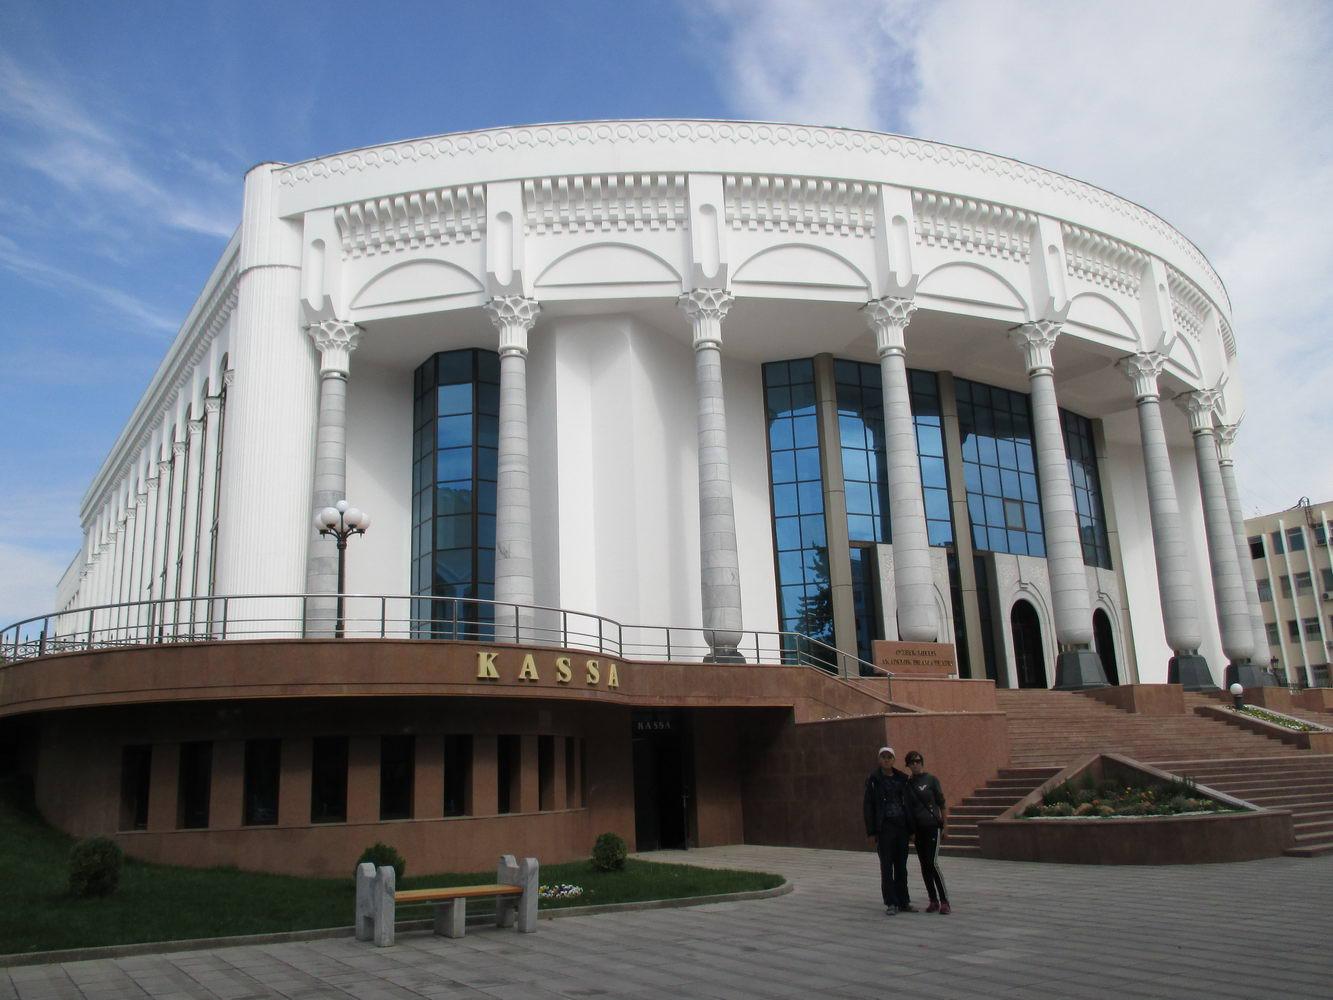 театр. прогулка и достопримечательности города. узбекистан ташкент